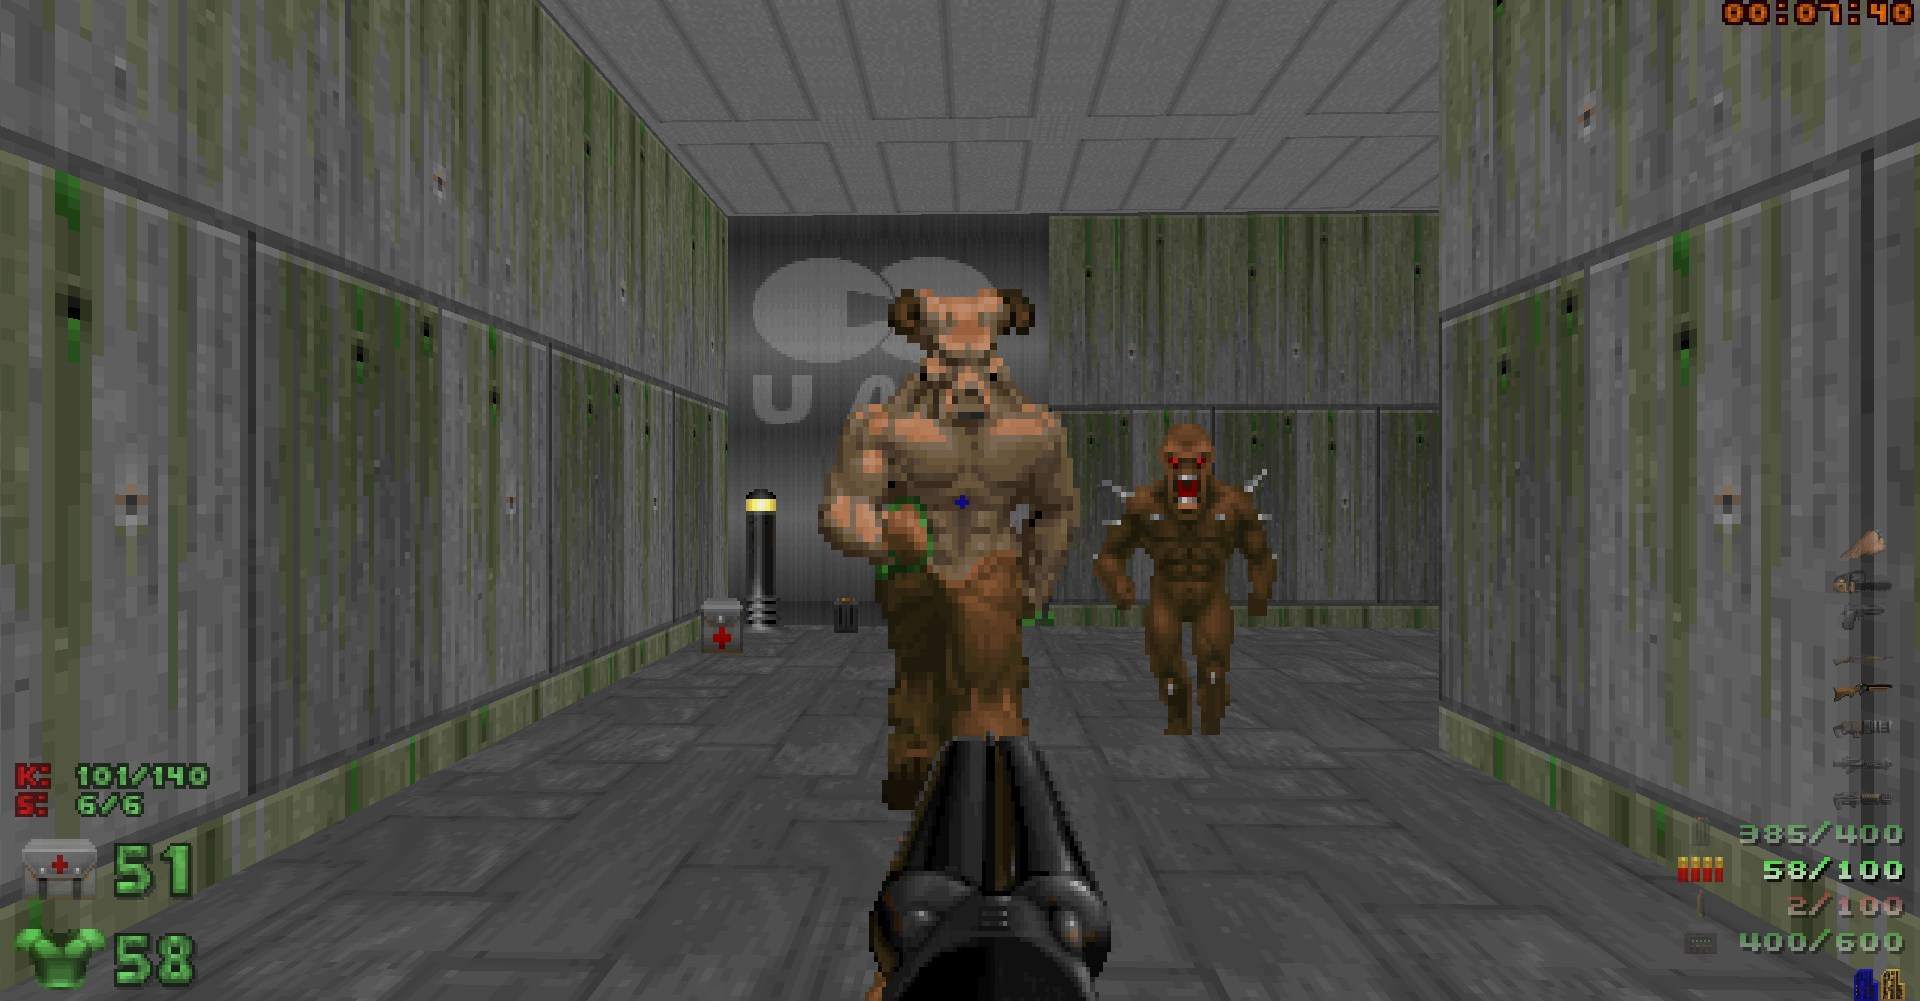 Screenshot_Doom_20210327_111420.png.e7cb3fef5ff0ae91e340f17c60a35c55.png